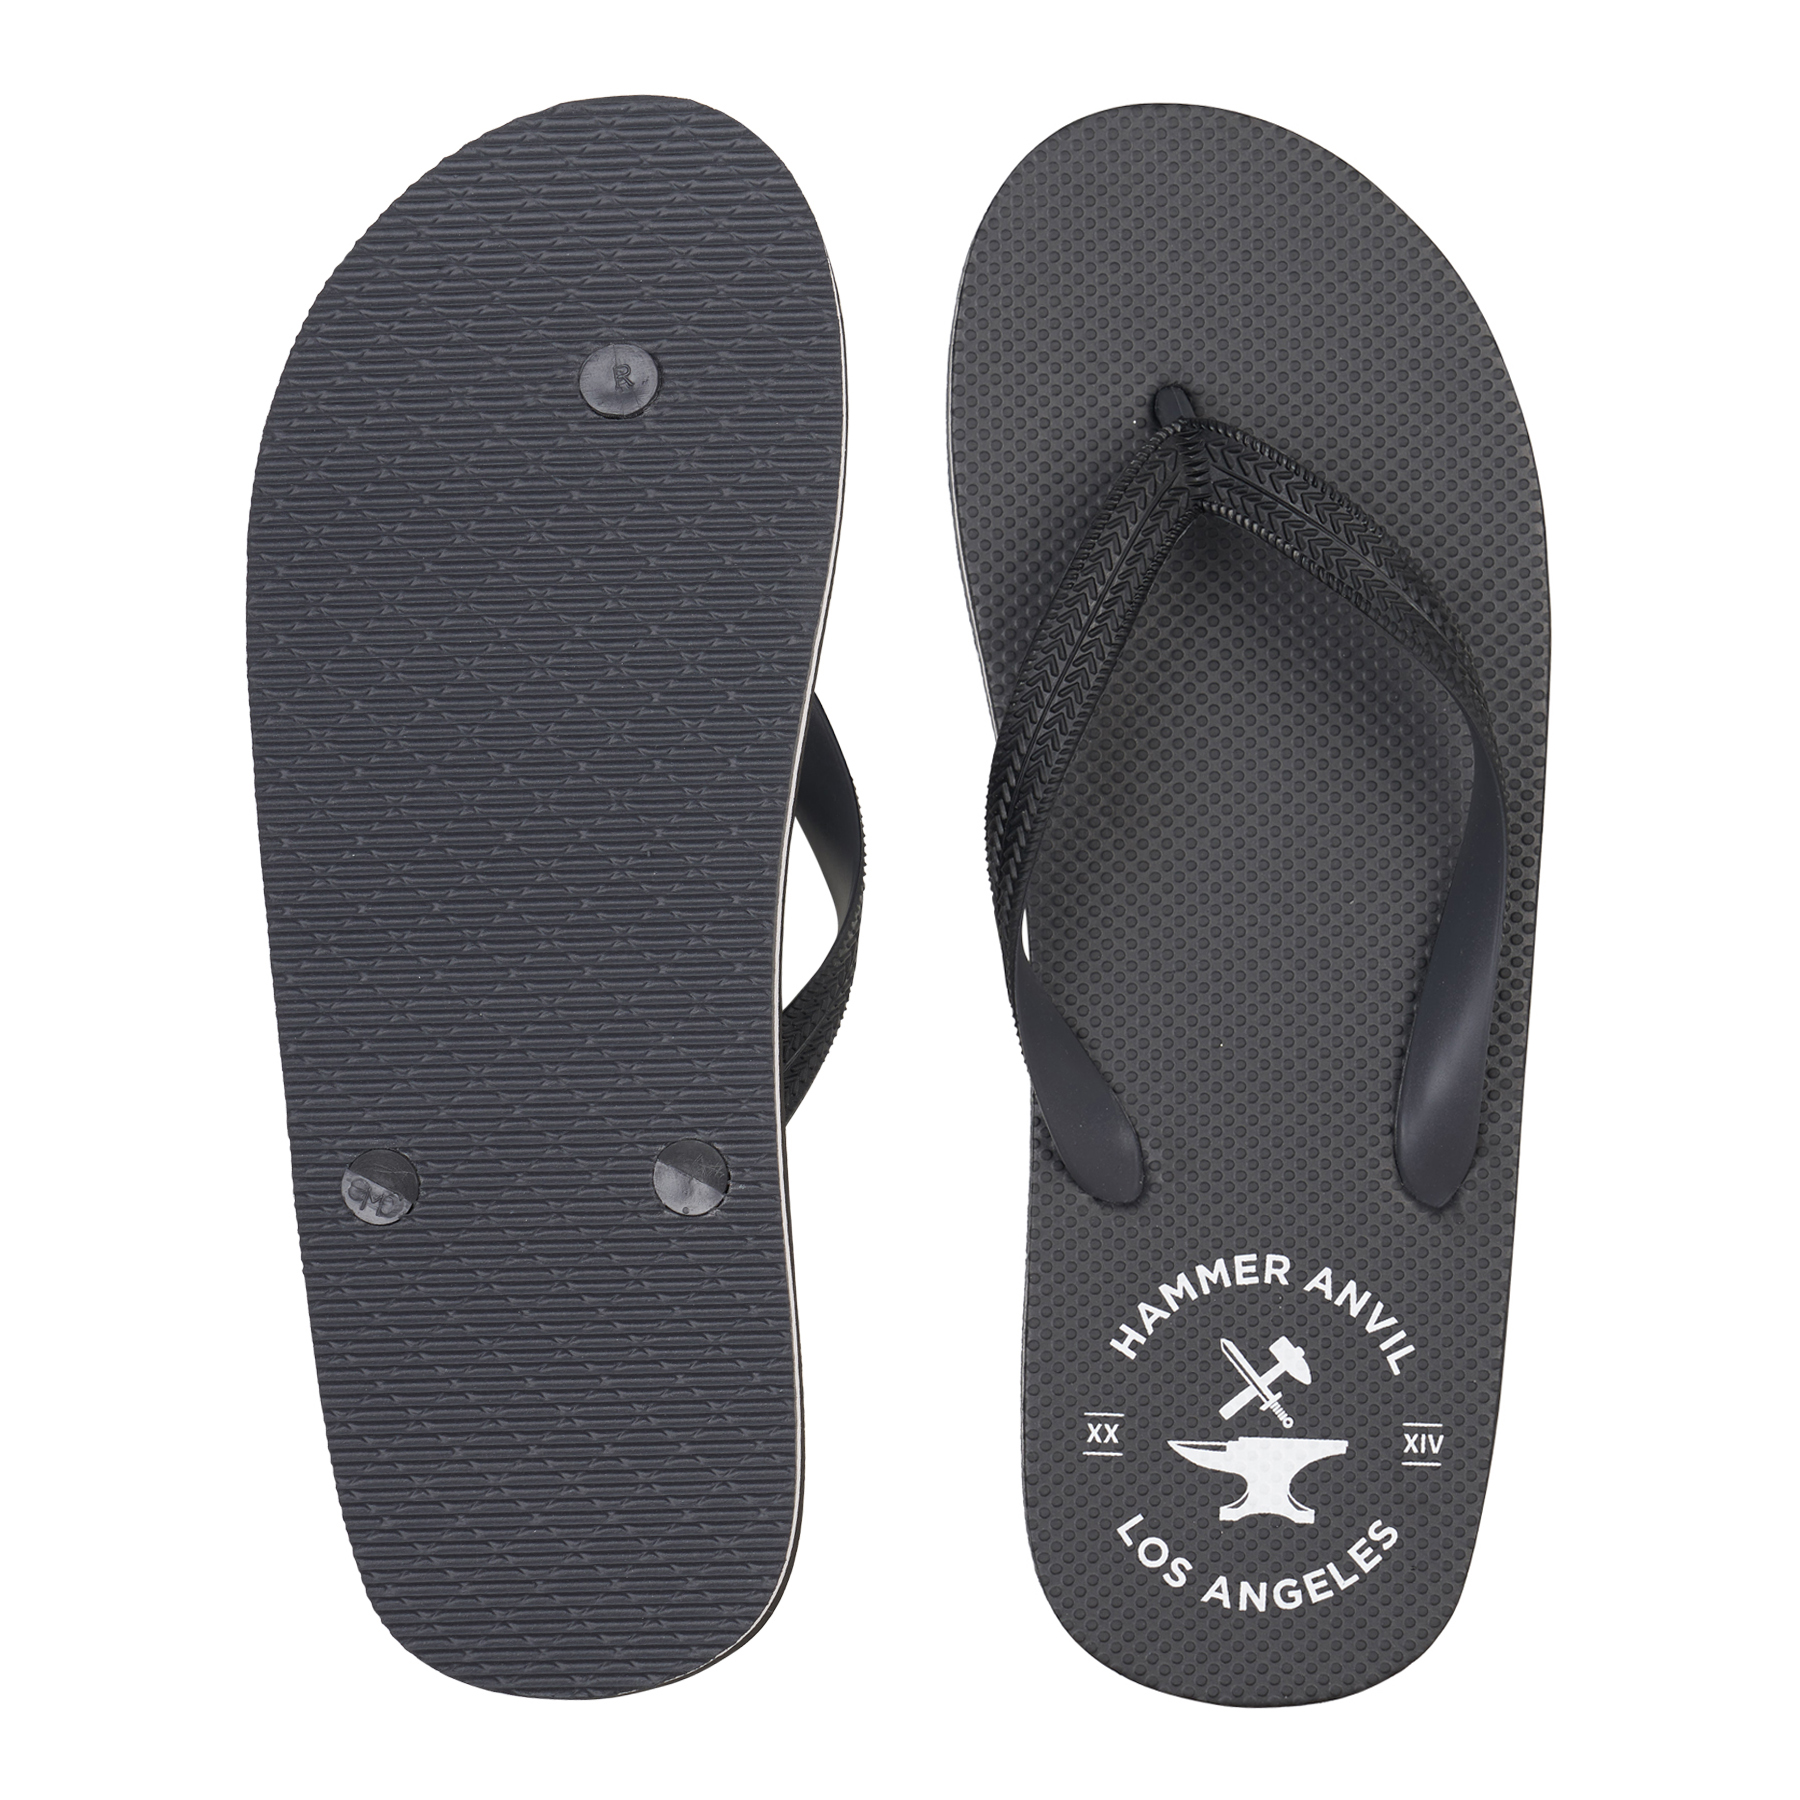 Hammer-Anvil-Mens-Flip-Flops-Casual-Thong-Summer-Sandals-Comfortable-Beach-Shoes thumbnail 18